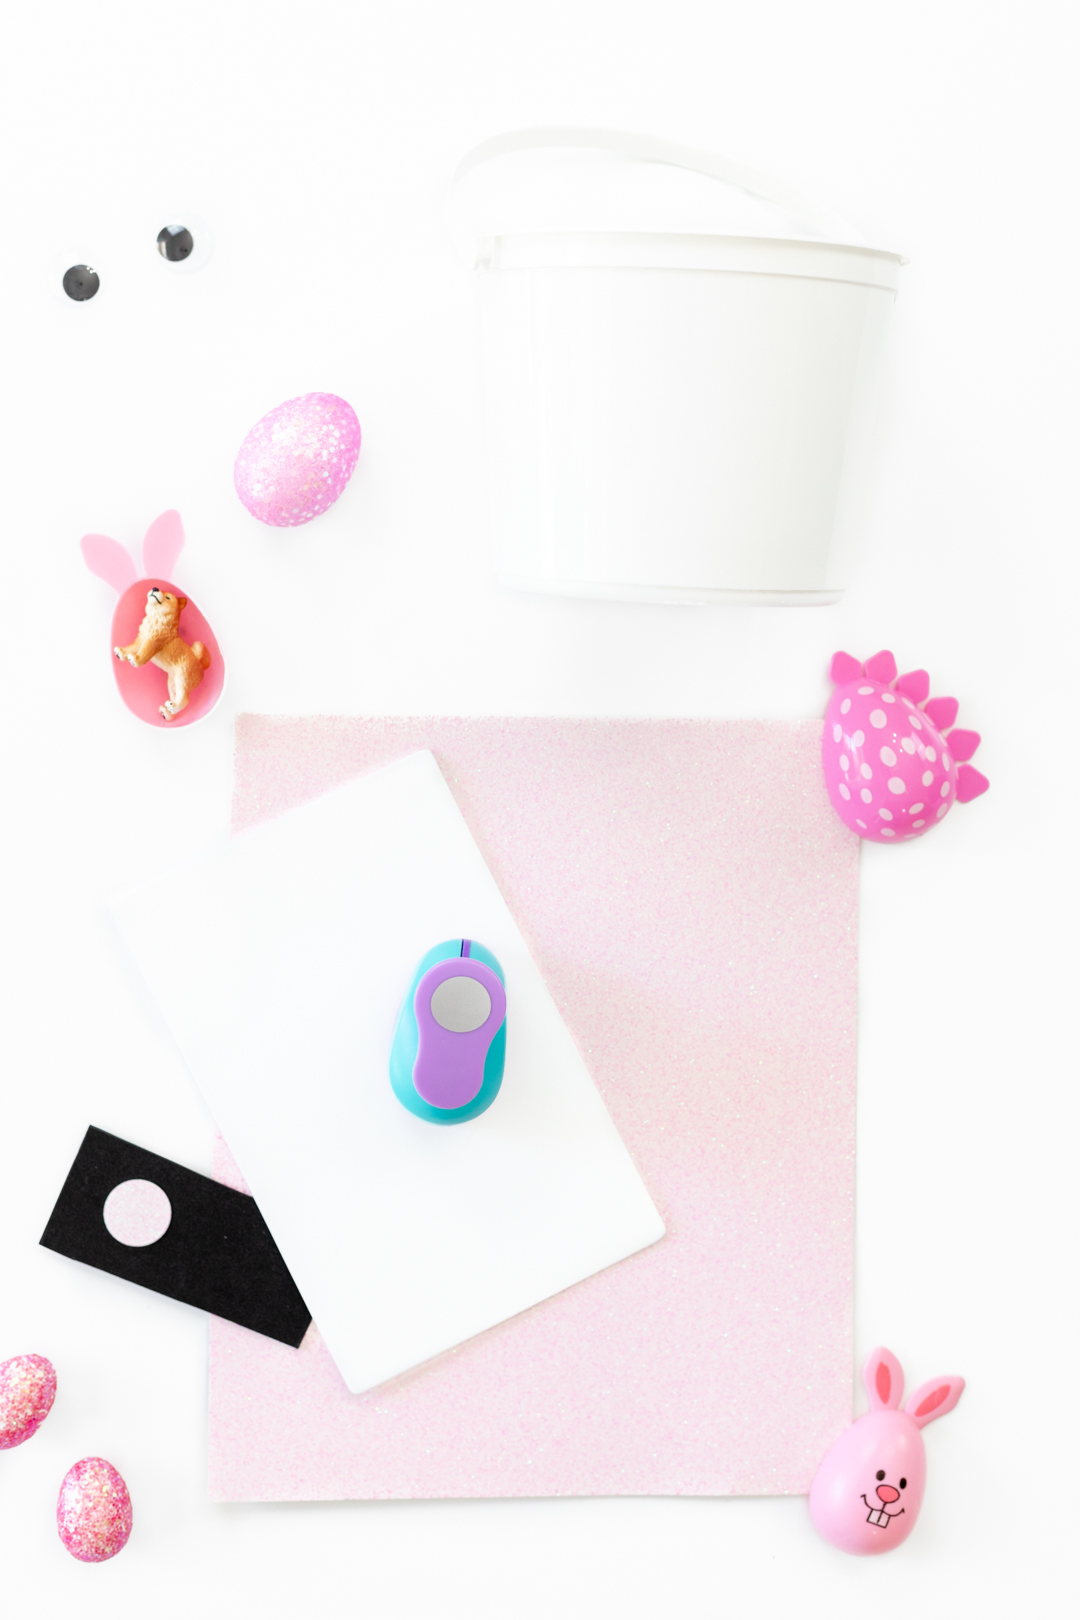 diy easter basket items. glitter paper, foam, glue, hole punch